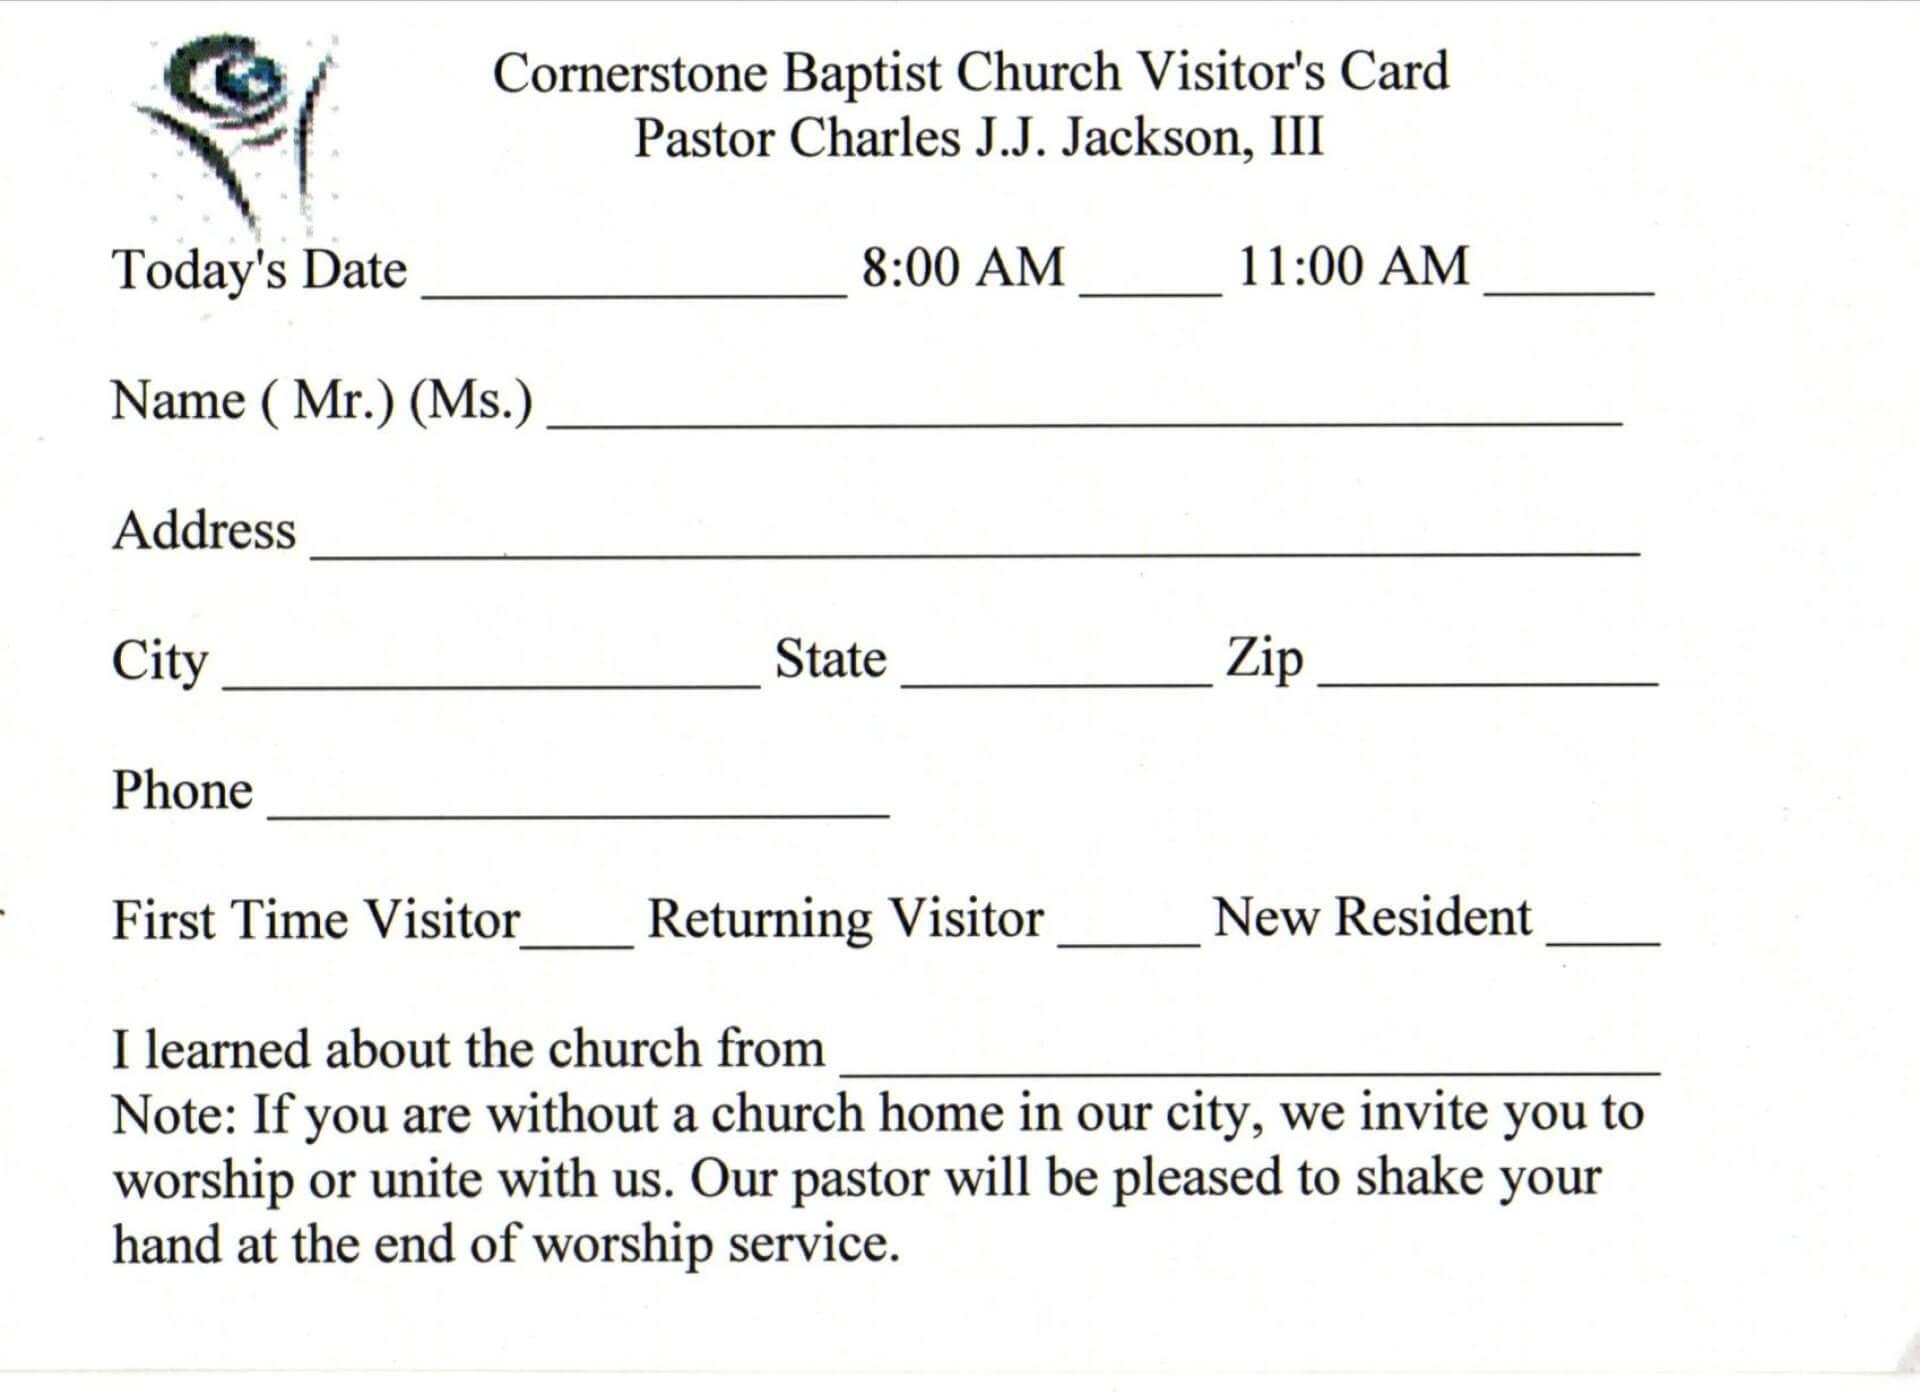 019 Template Ideas Church Visitor Card Word Impressive With Church Visitor Card Template Word